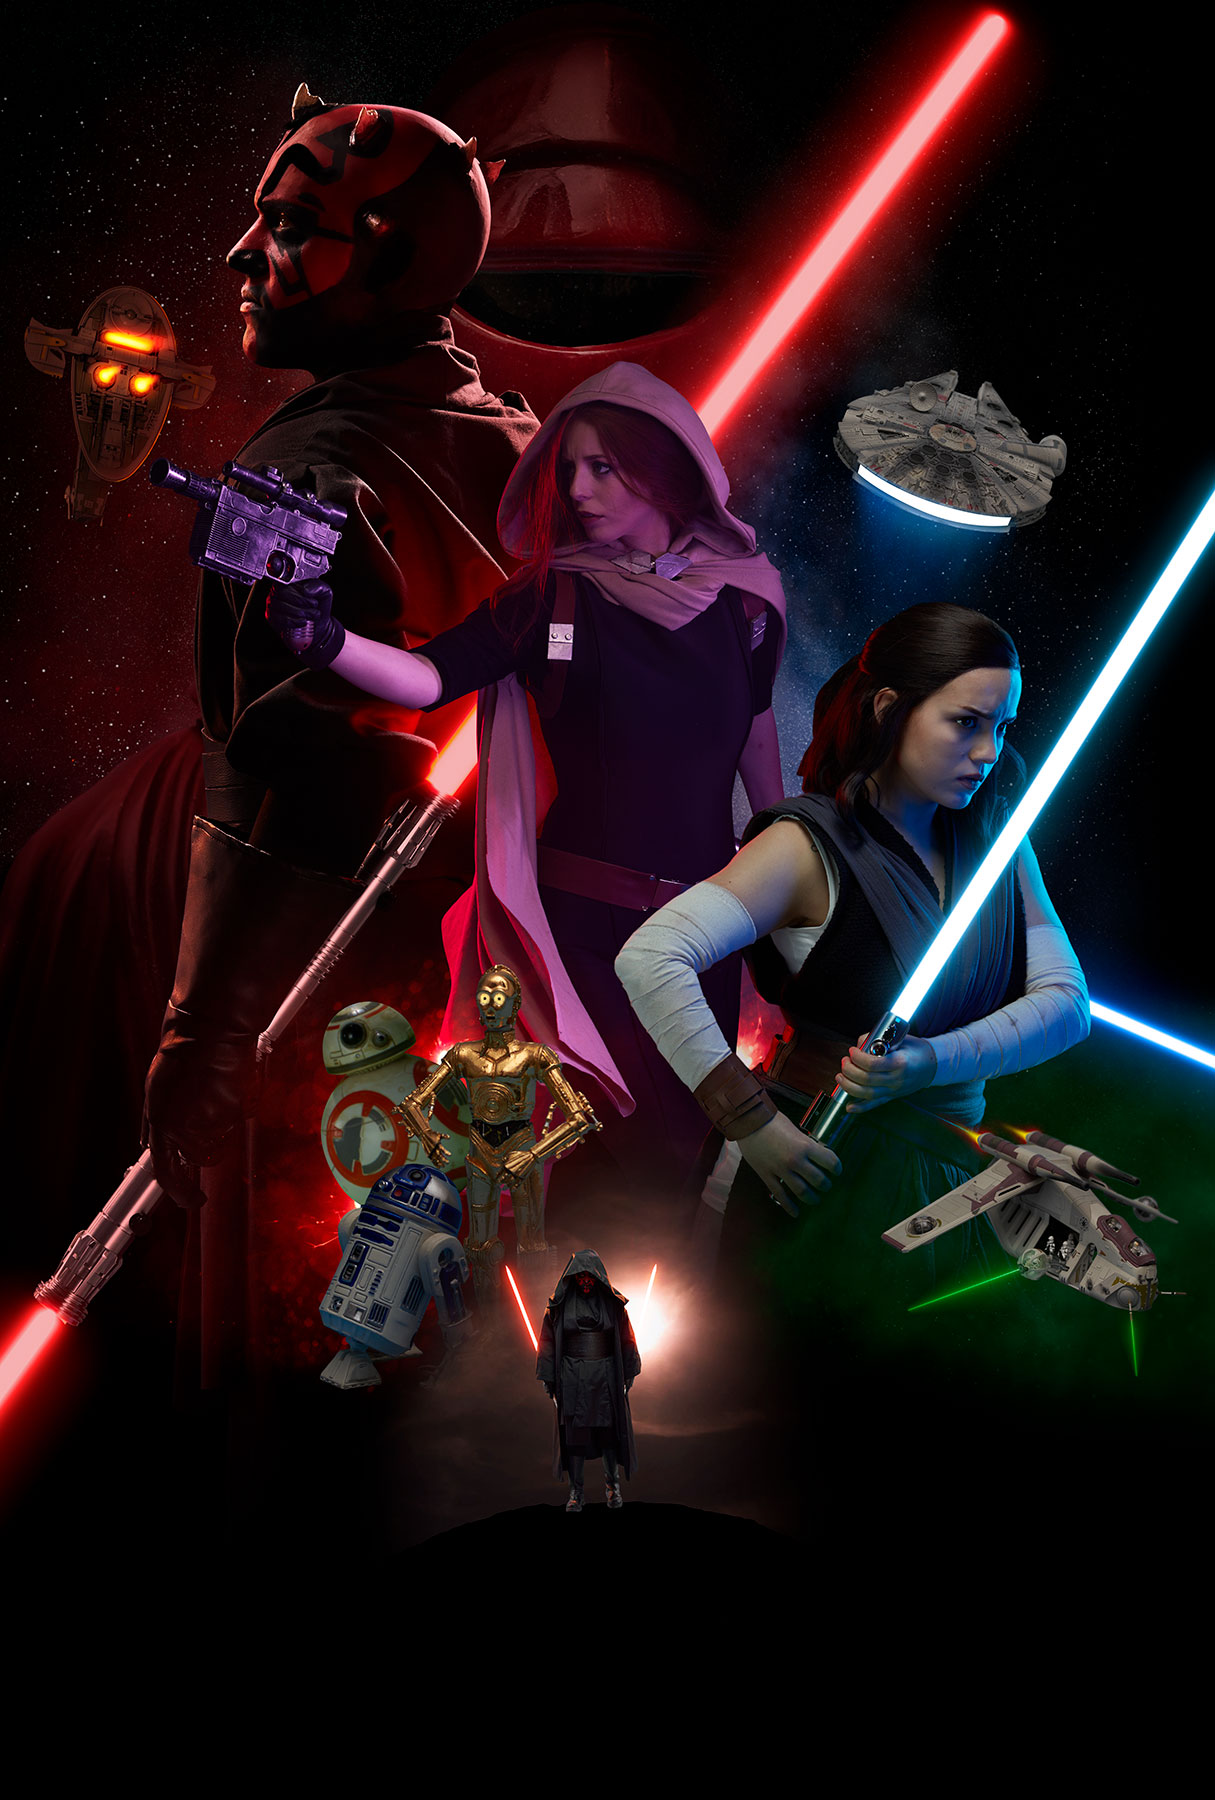 Sayanoff Arthur Star Wars Poster 02 06